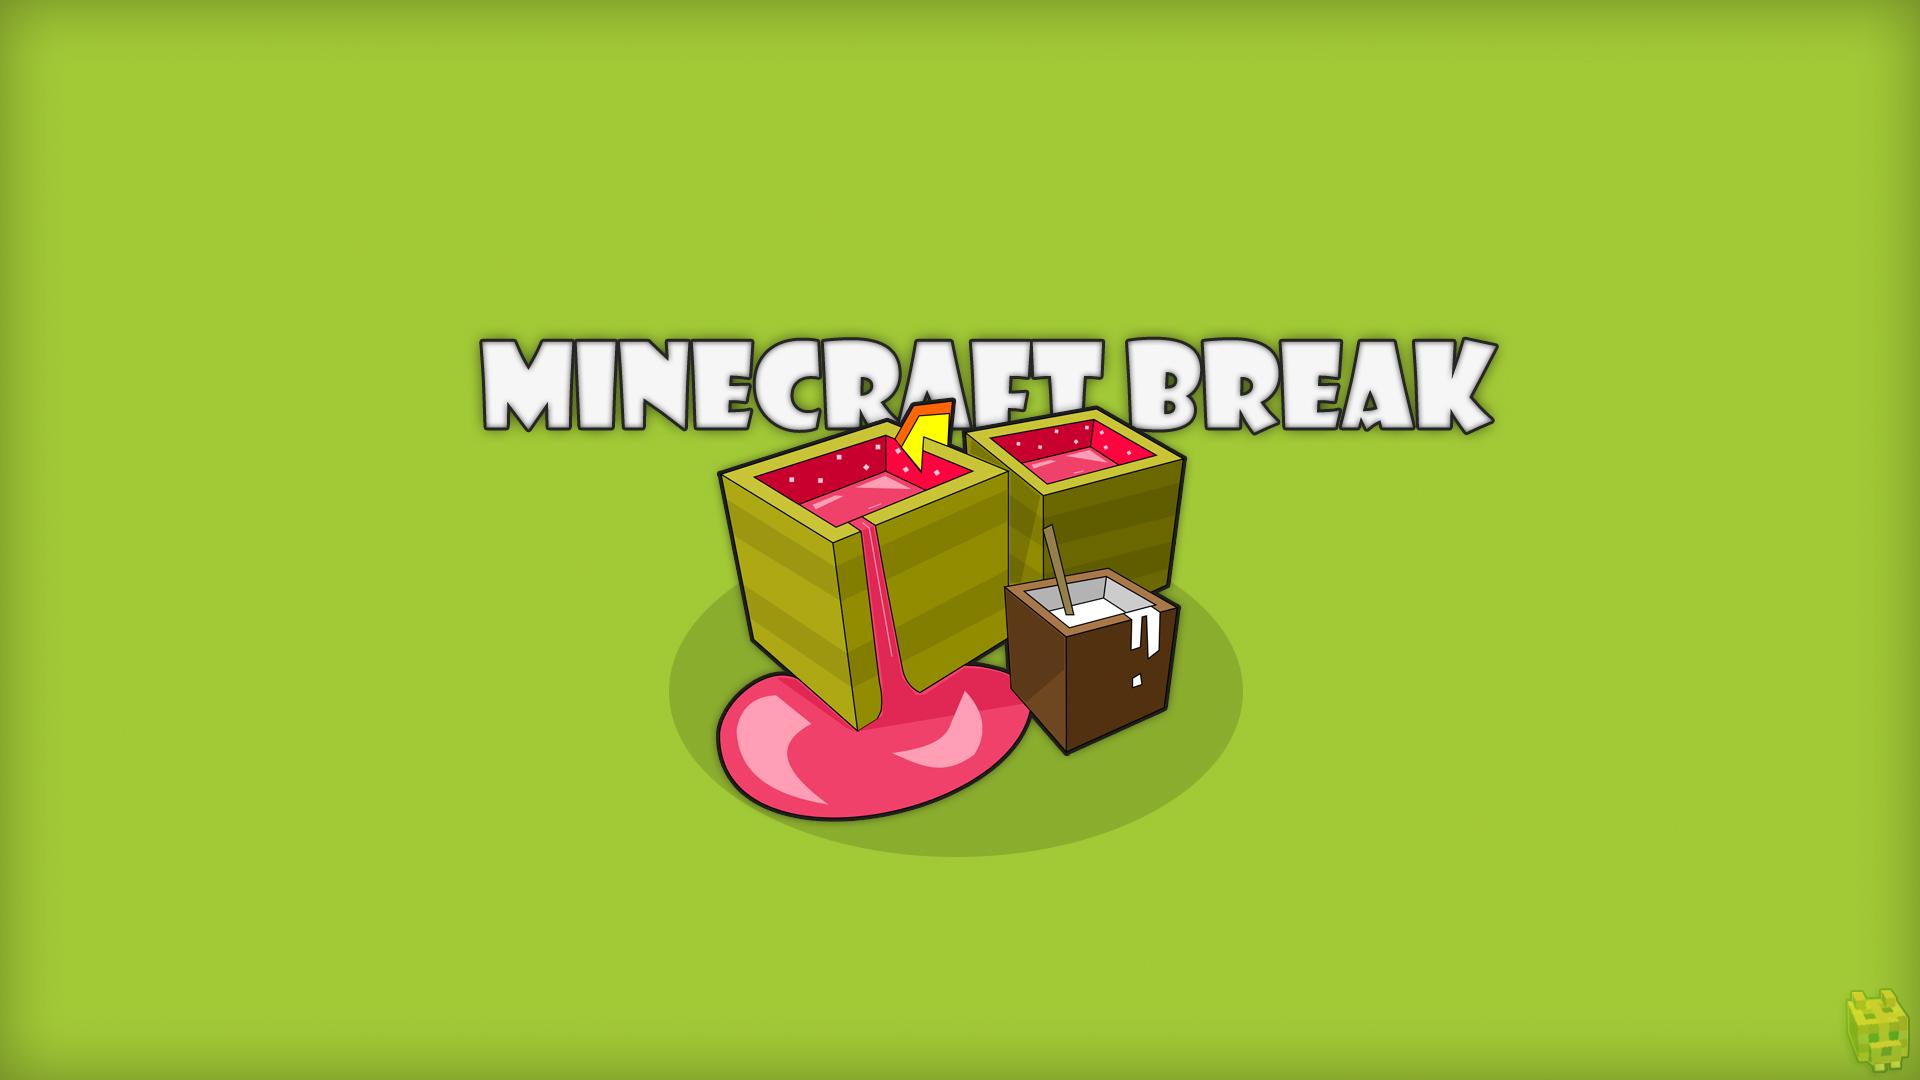 Best Wallpaper Minecraft Simple - minecraft_break___wallpaper_by_dentvanboo-d5mwhjn  Pictures_23488.jpg